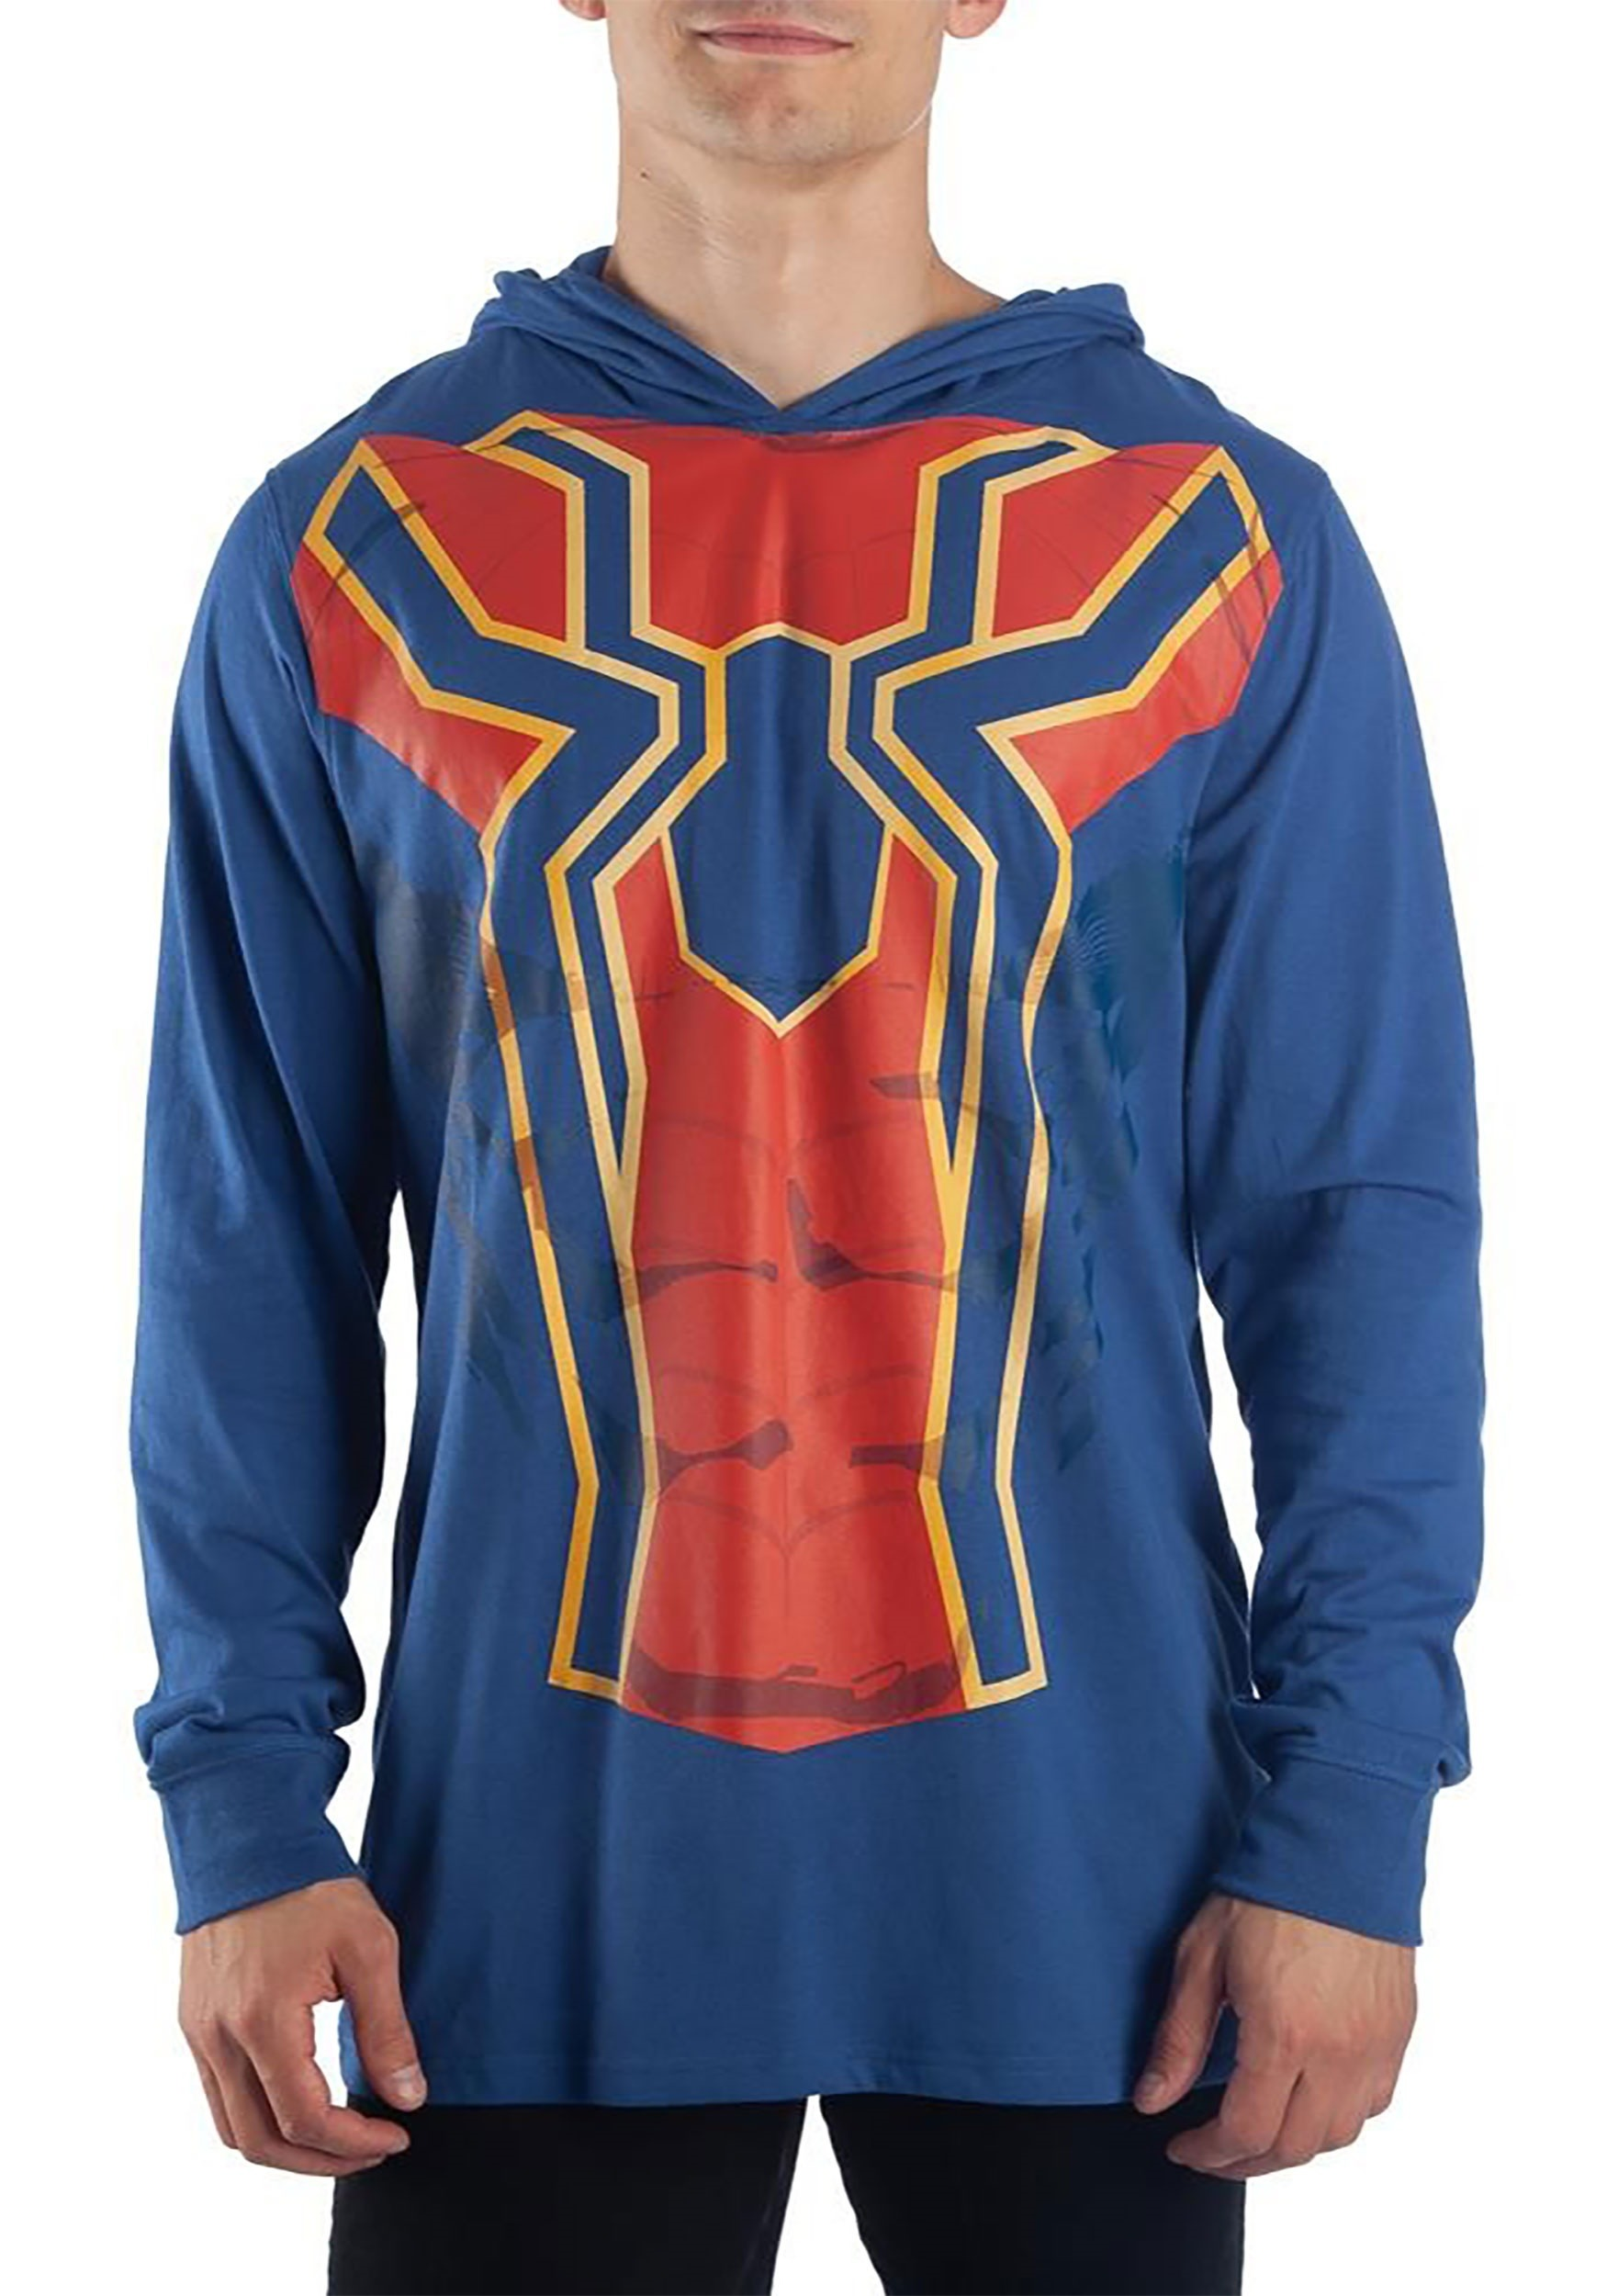 Men's Iron Spider Cosplay Light Weight Hoodie Costume